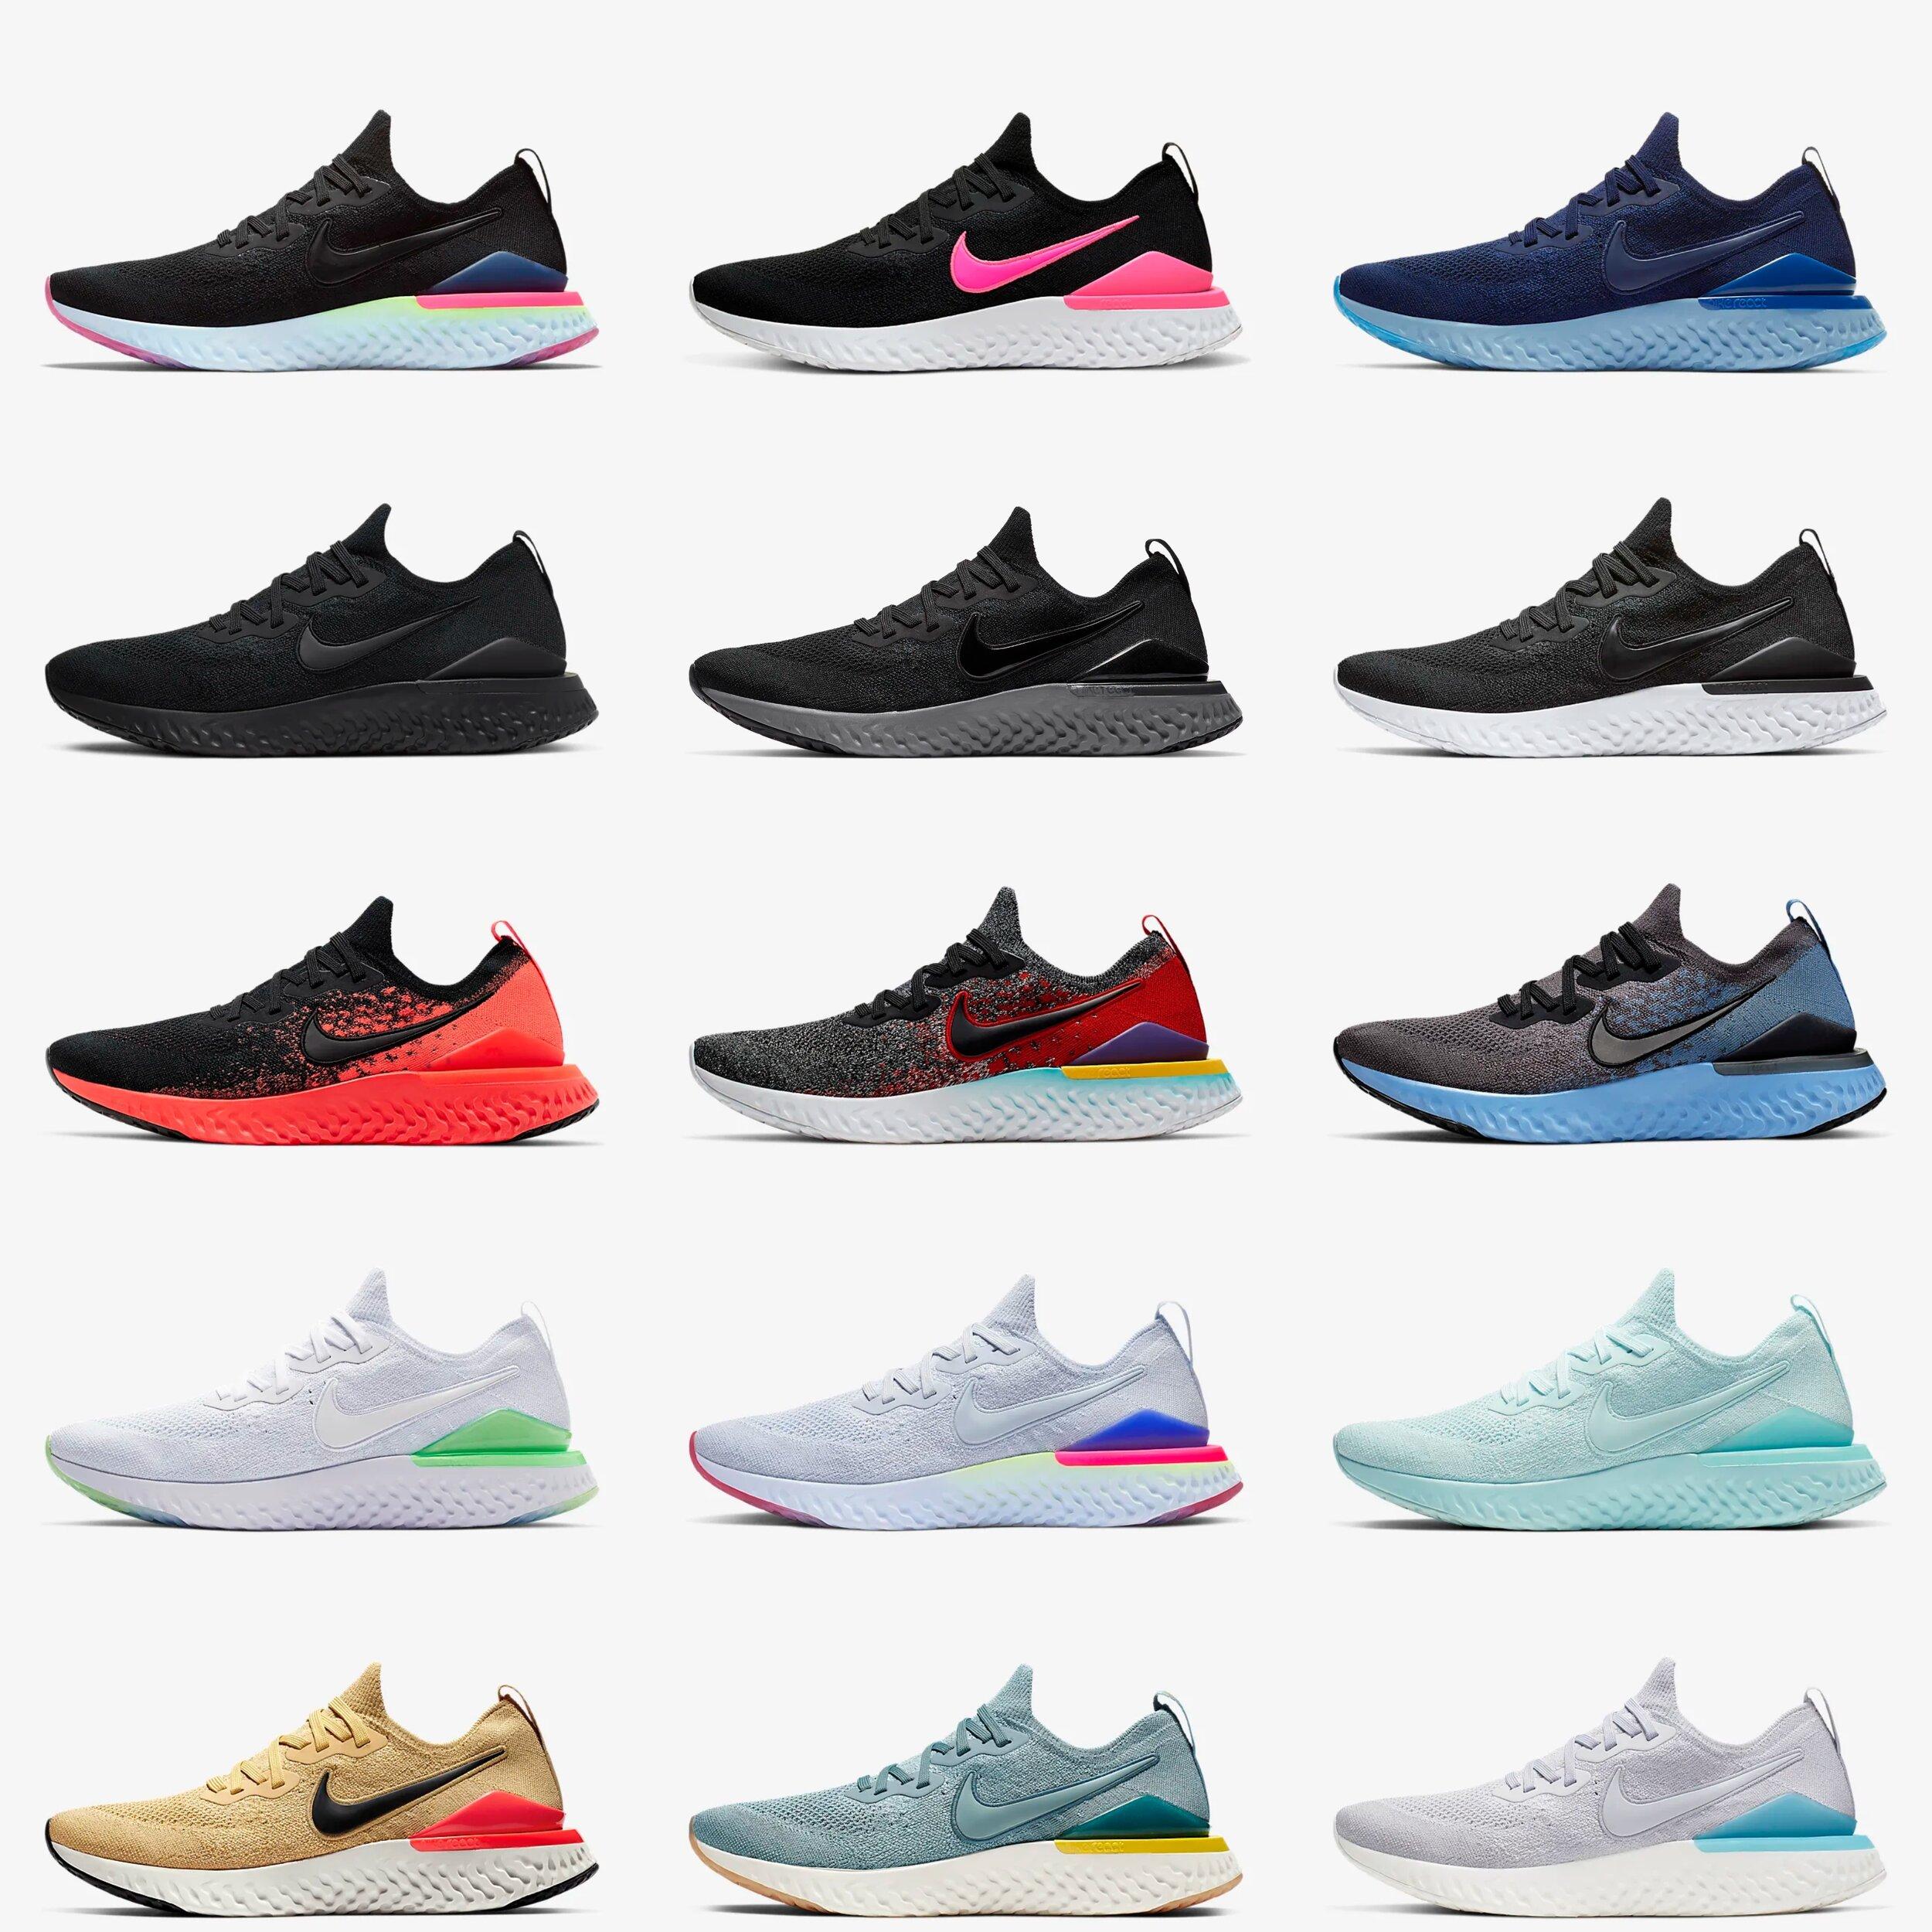 Nike Epic React Flyknit 2 Colorways